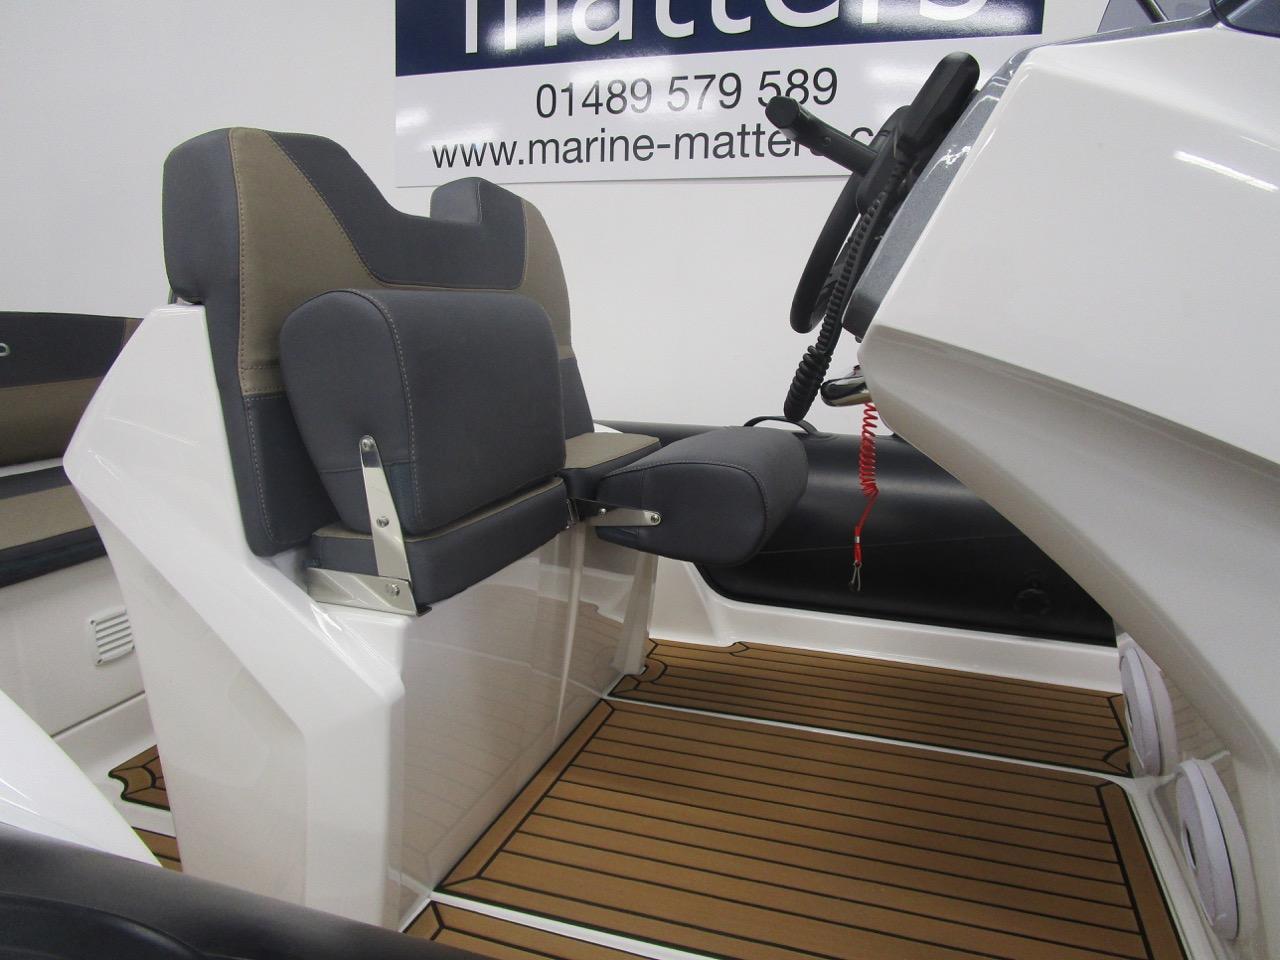 GRAND Golden Line G580 RIB helm seat split